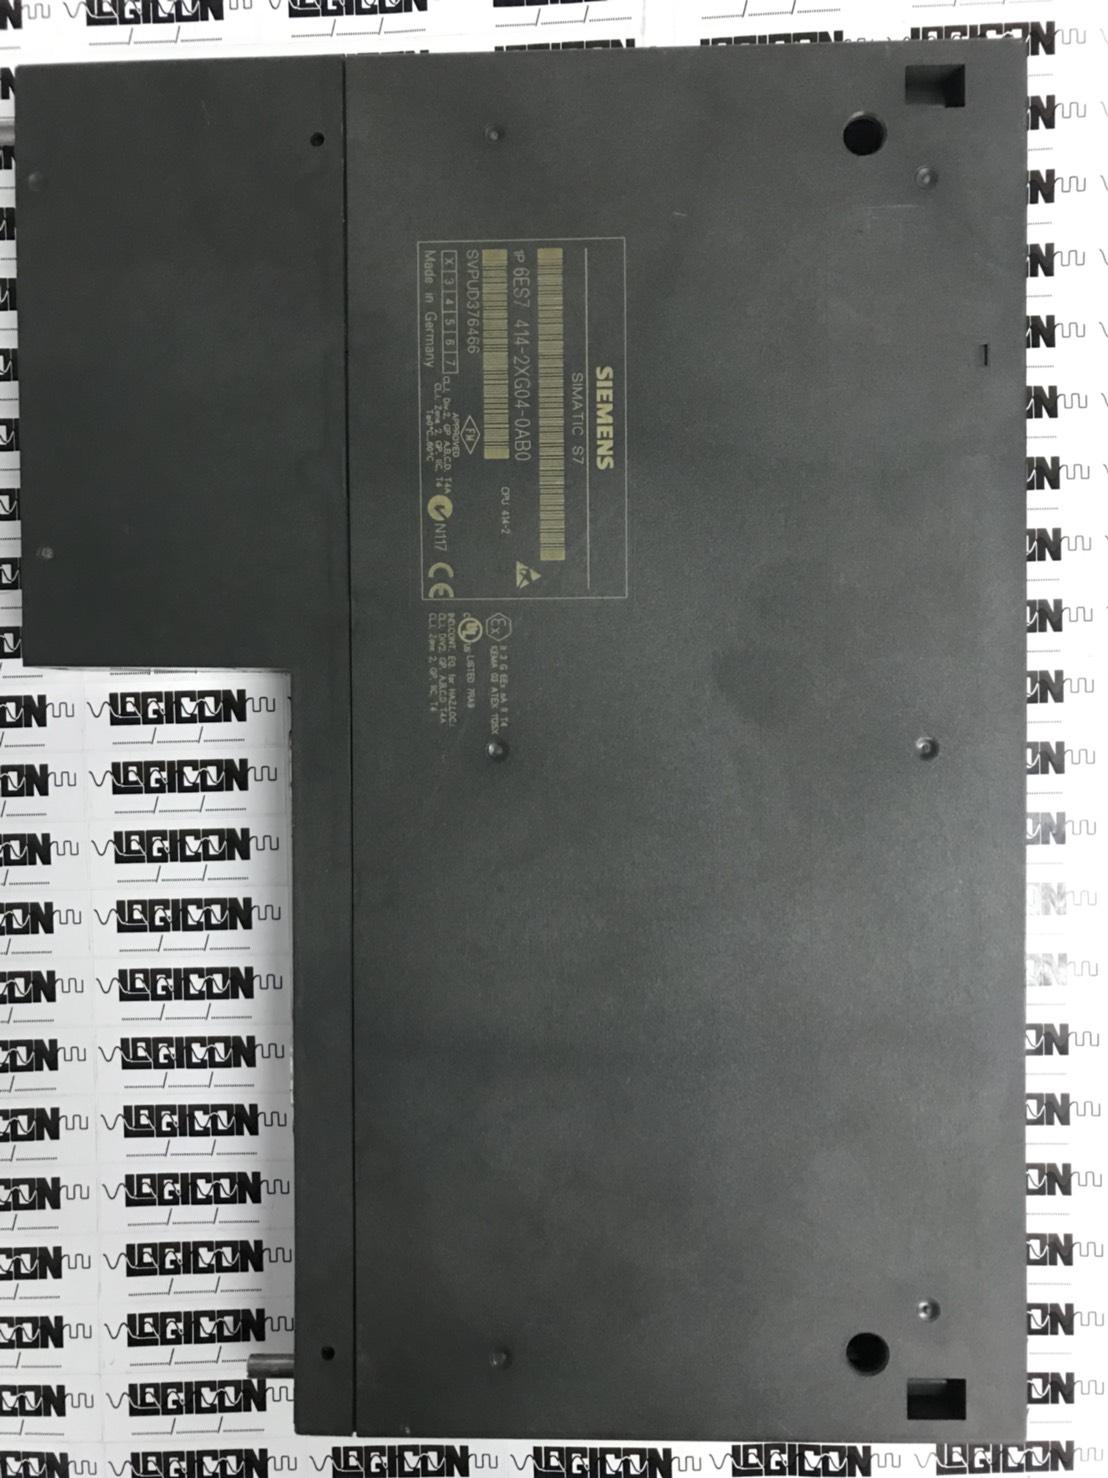 SIMATIC S7-400,6ES7414-2XG04-0AB0 – LOGICON ENGINEERING Co ,Ltd